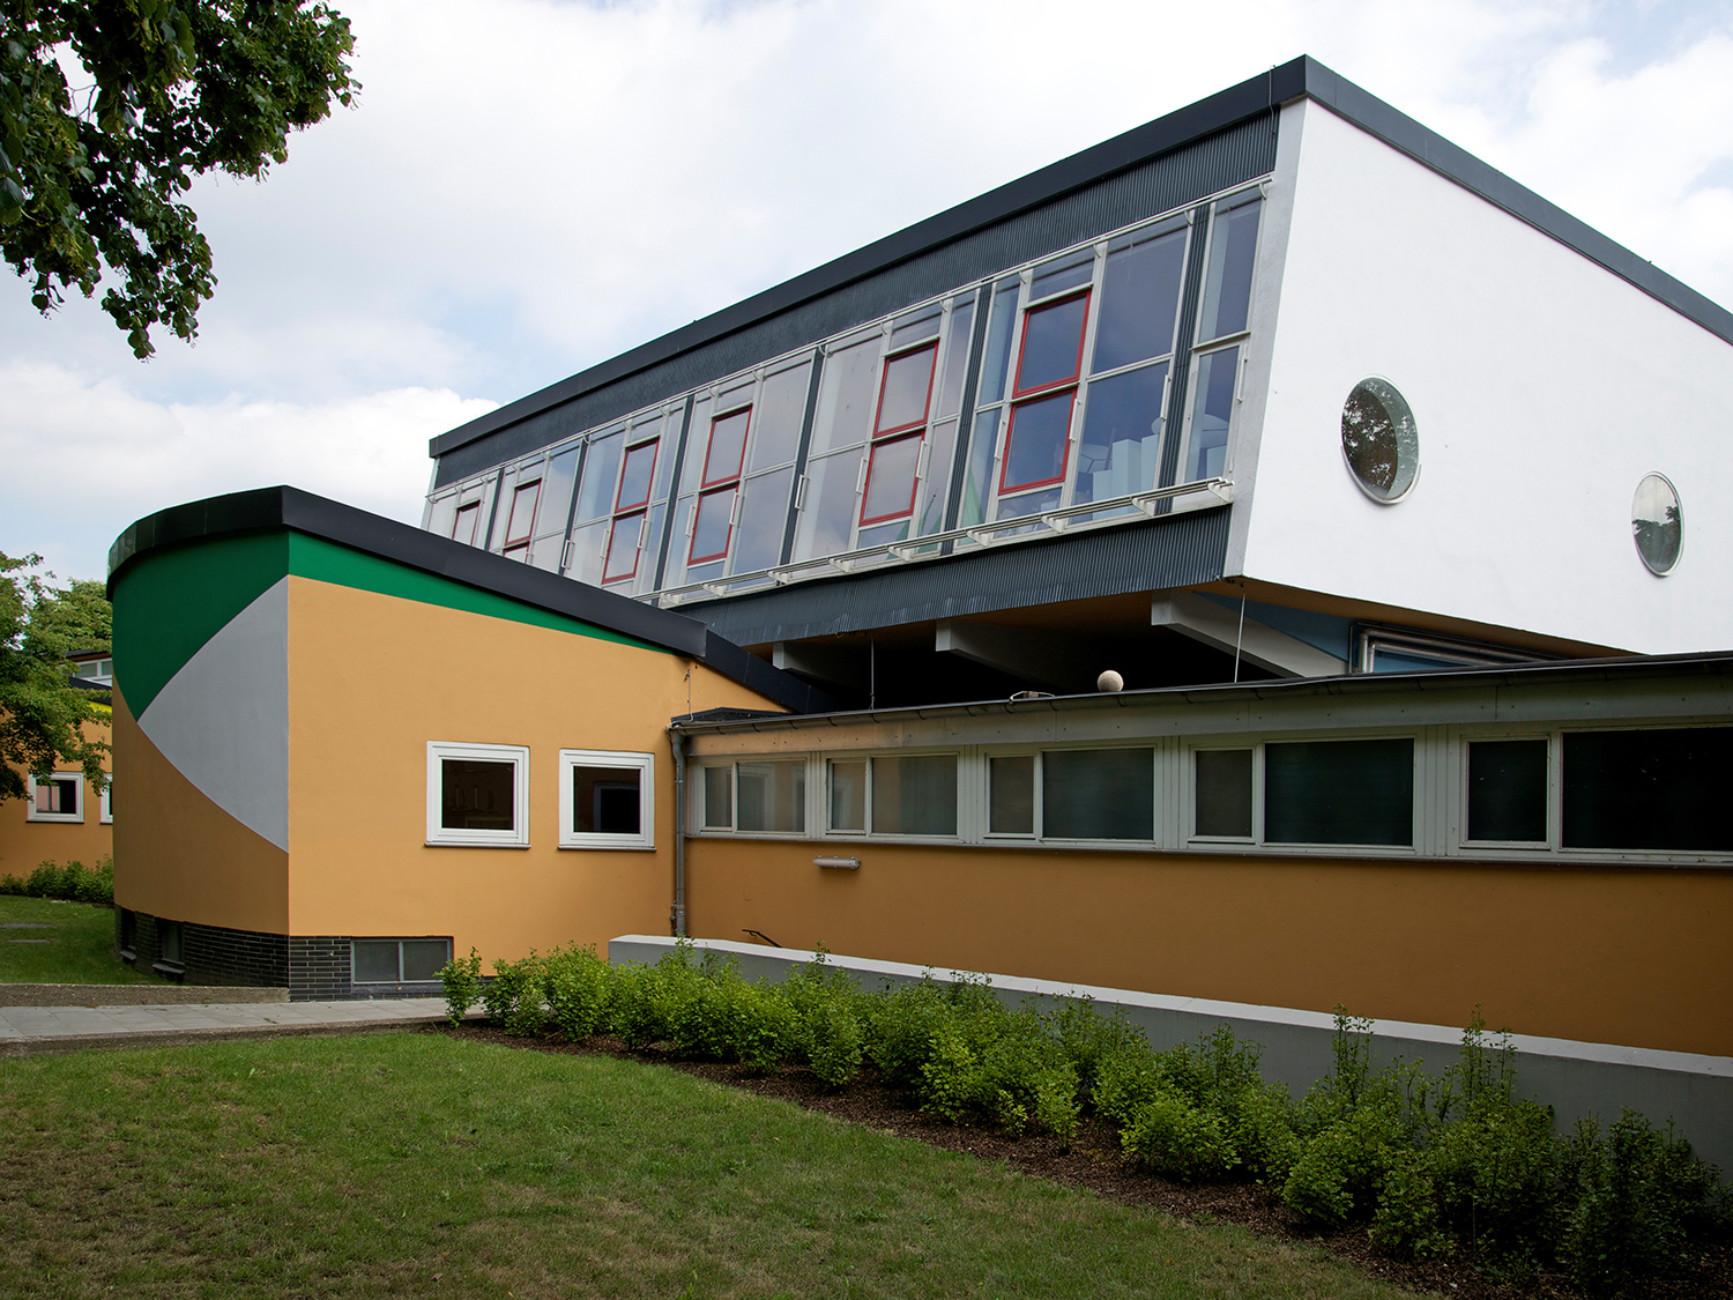 Geschwister-Scholl-Gymnasium, Lünen (1955-1962)